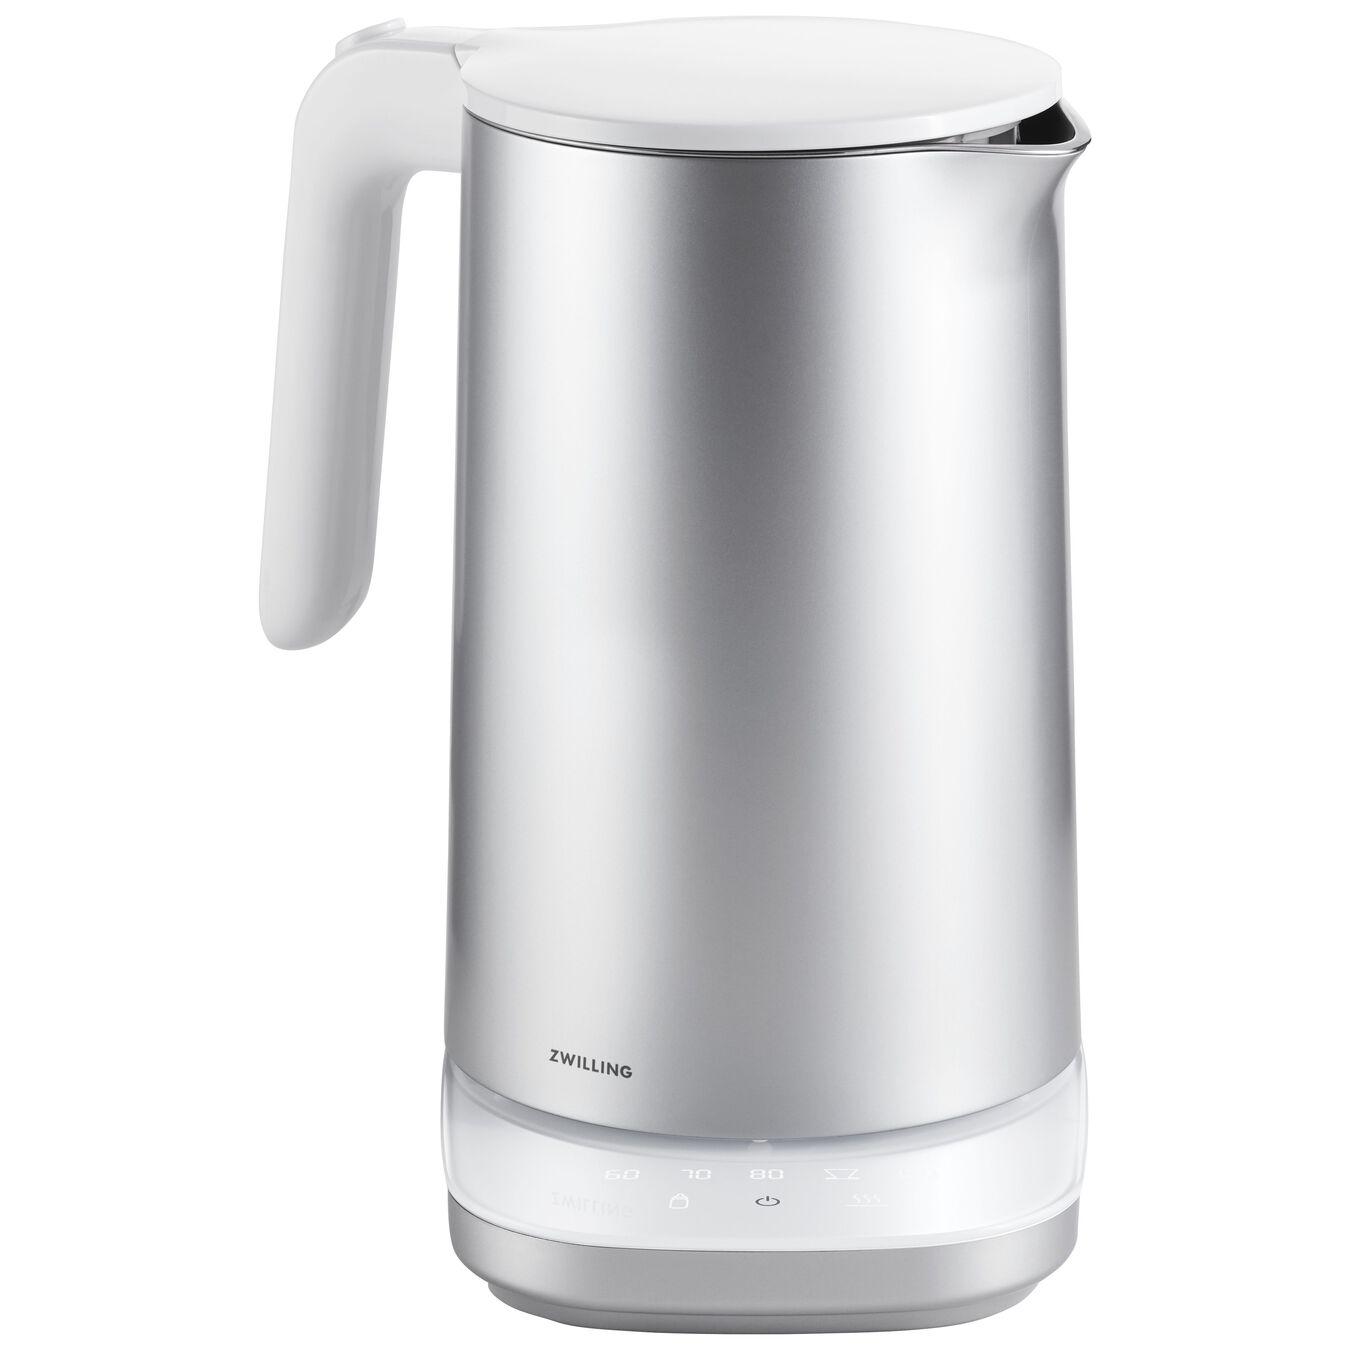 Wasserkocher Pro, 1,5 l, Silber,,large 5